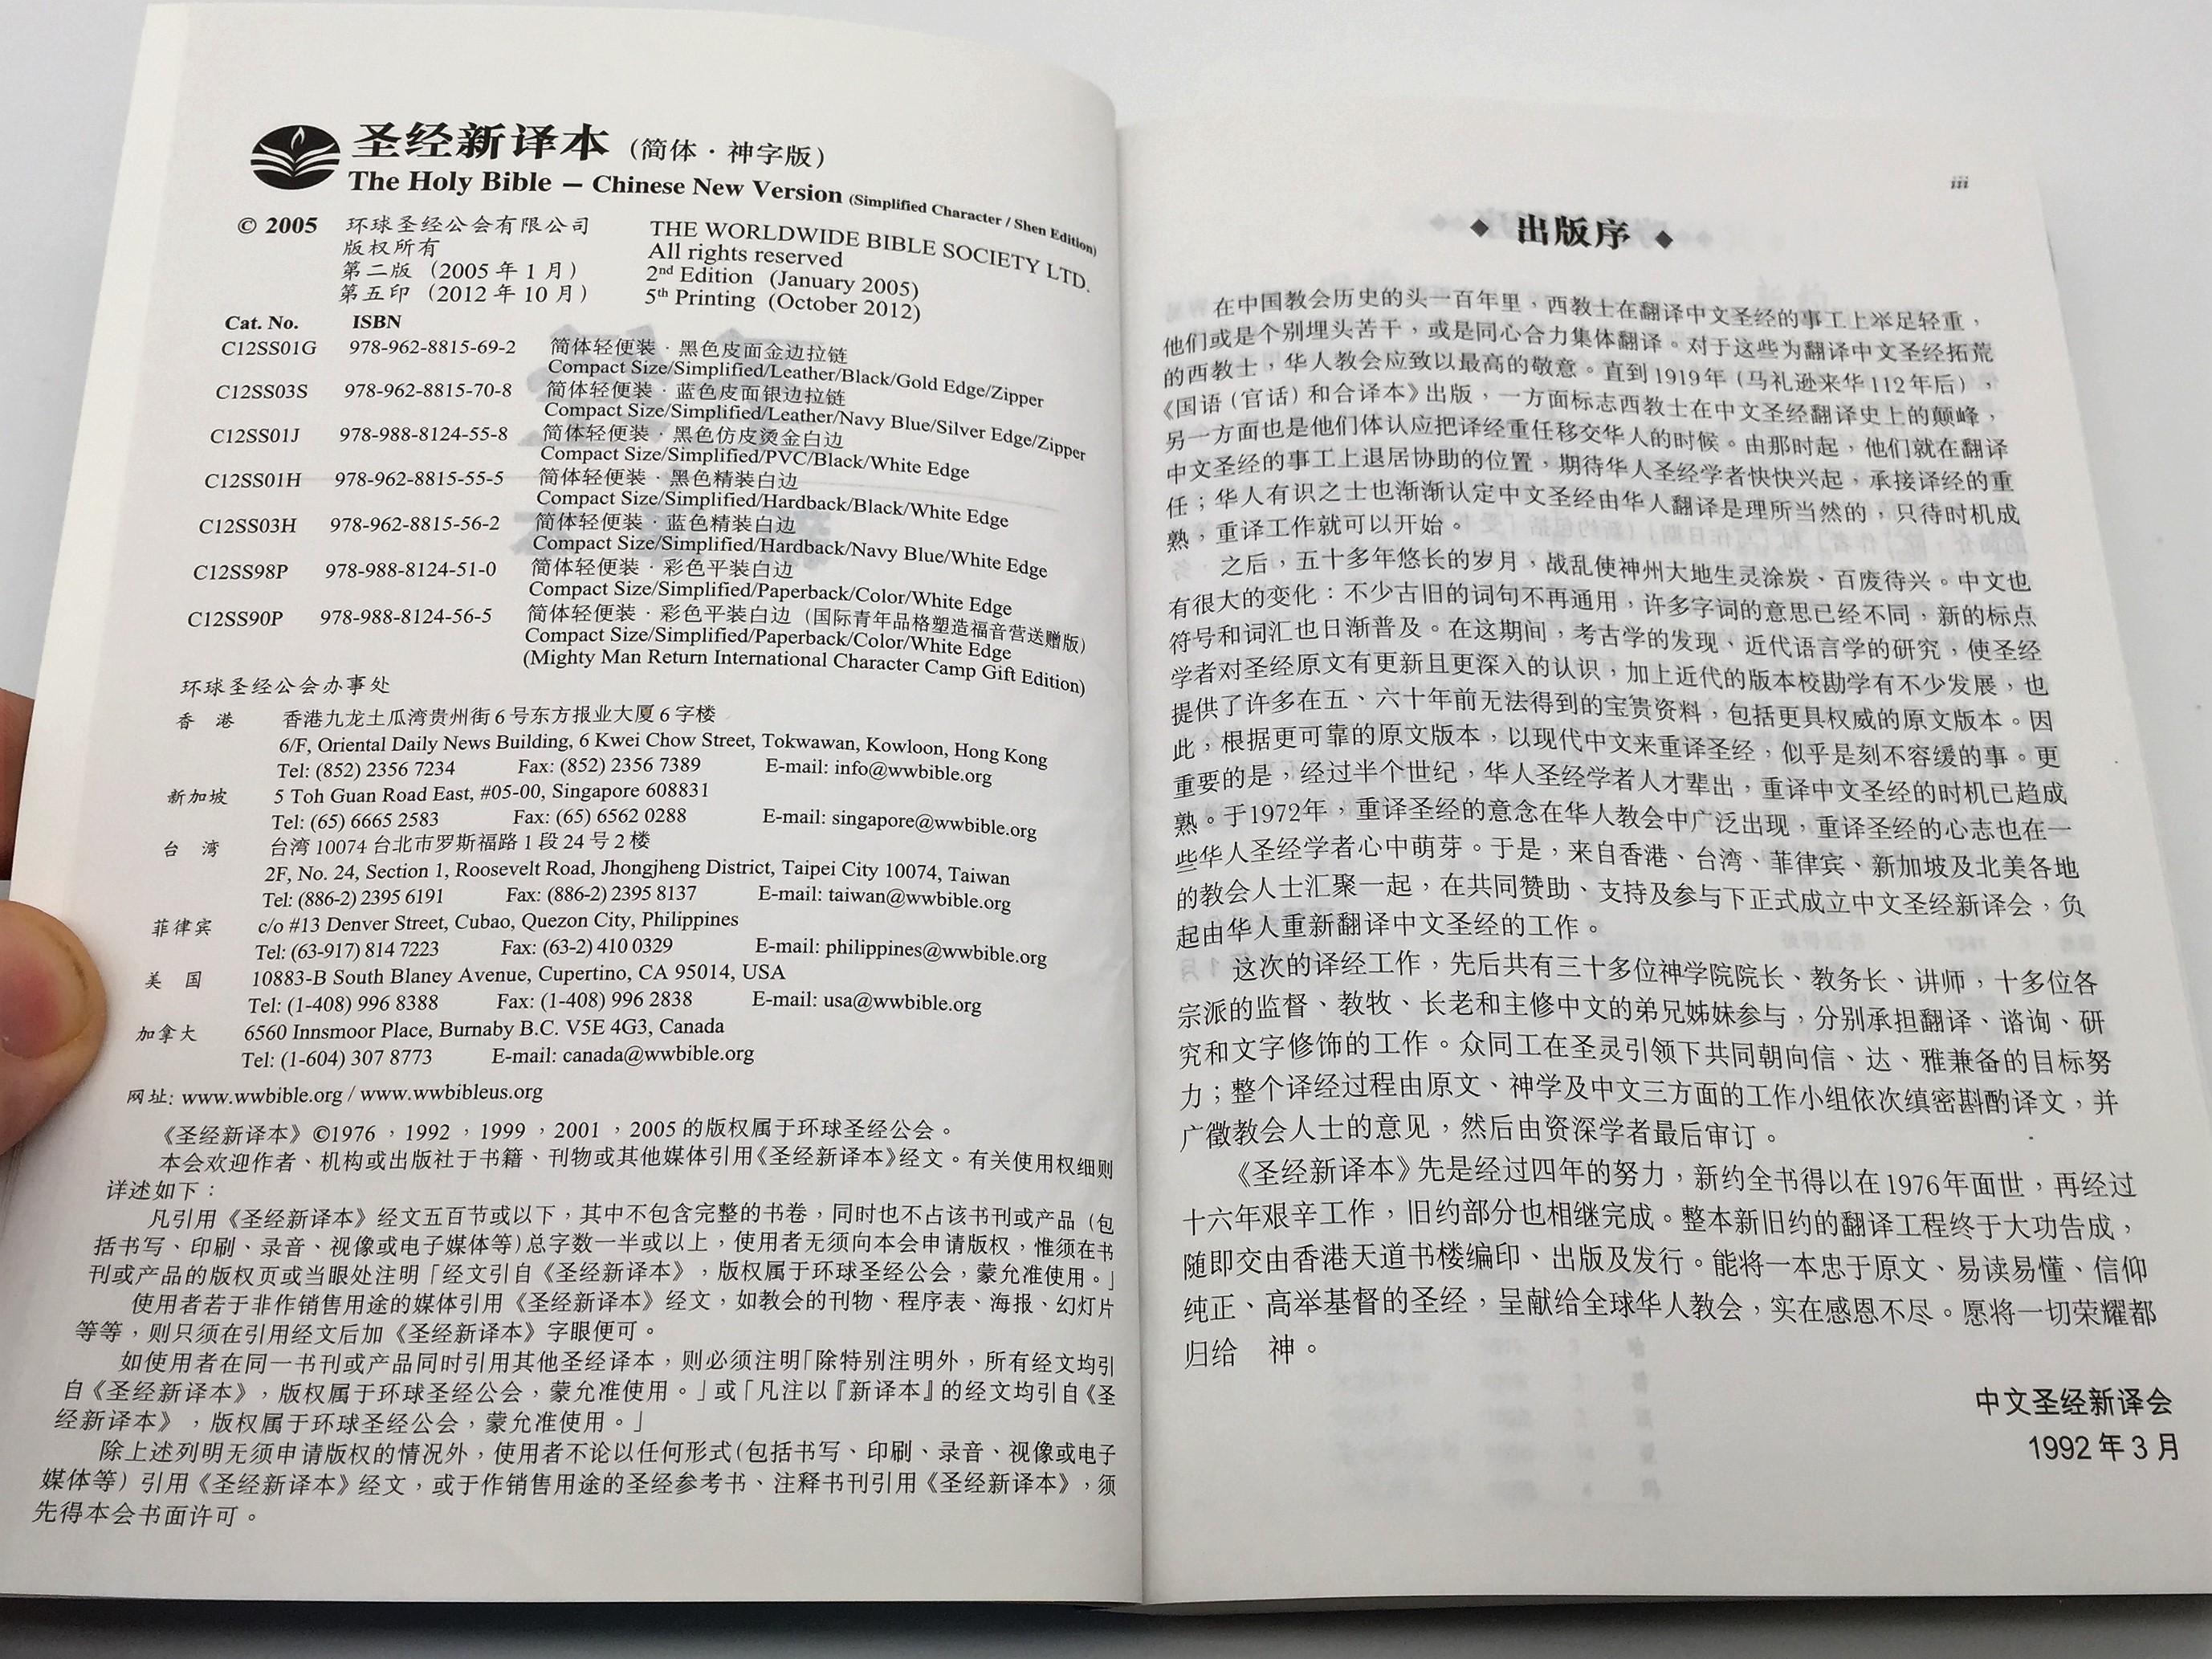 img-9386.jpg